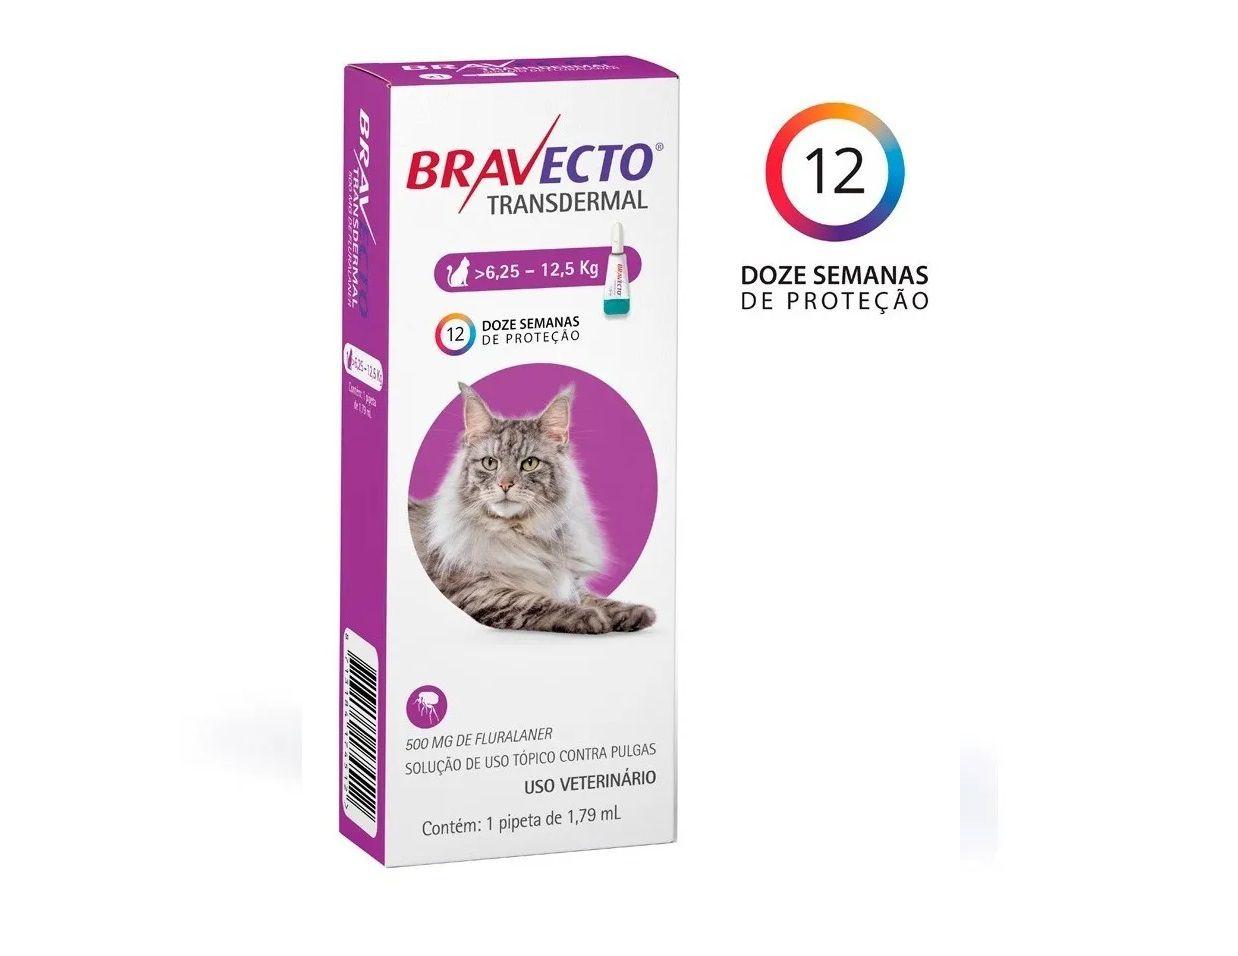 Antipulgas Bravecto Transdermal Gatos 6,25 A 12,5kg Val 12/20